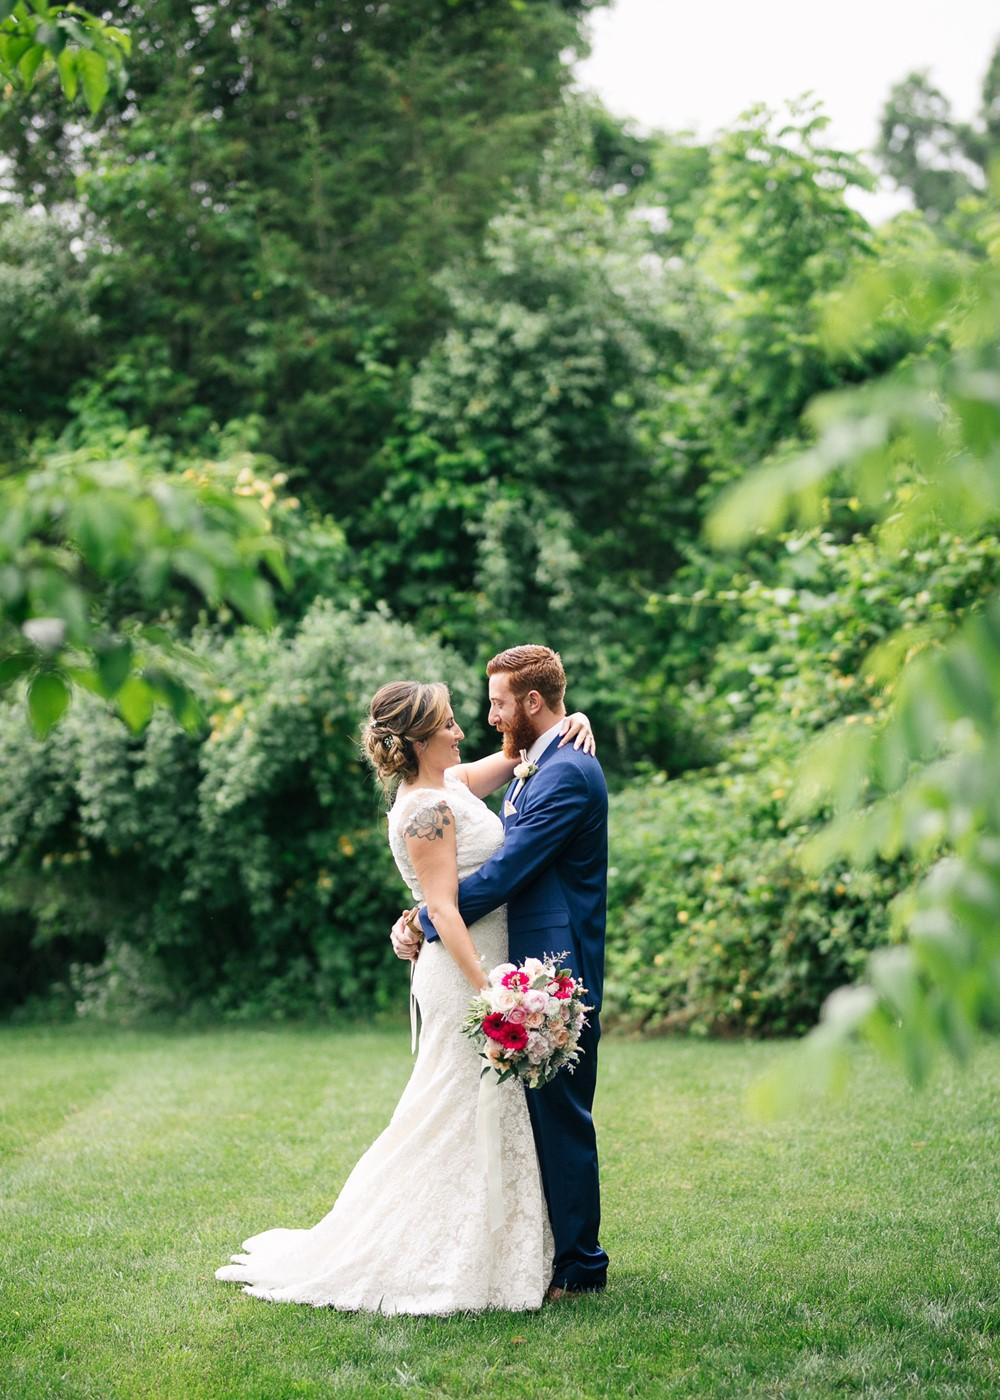 AJ & Kristin's Romantic Rustic-Vintage Barn Wedding